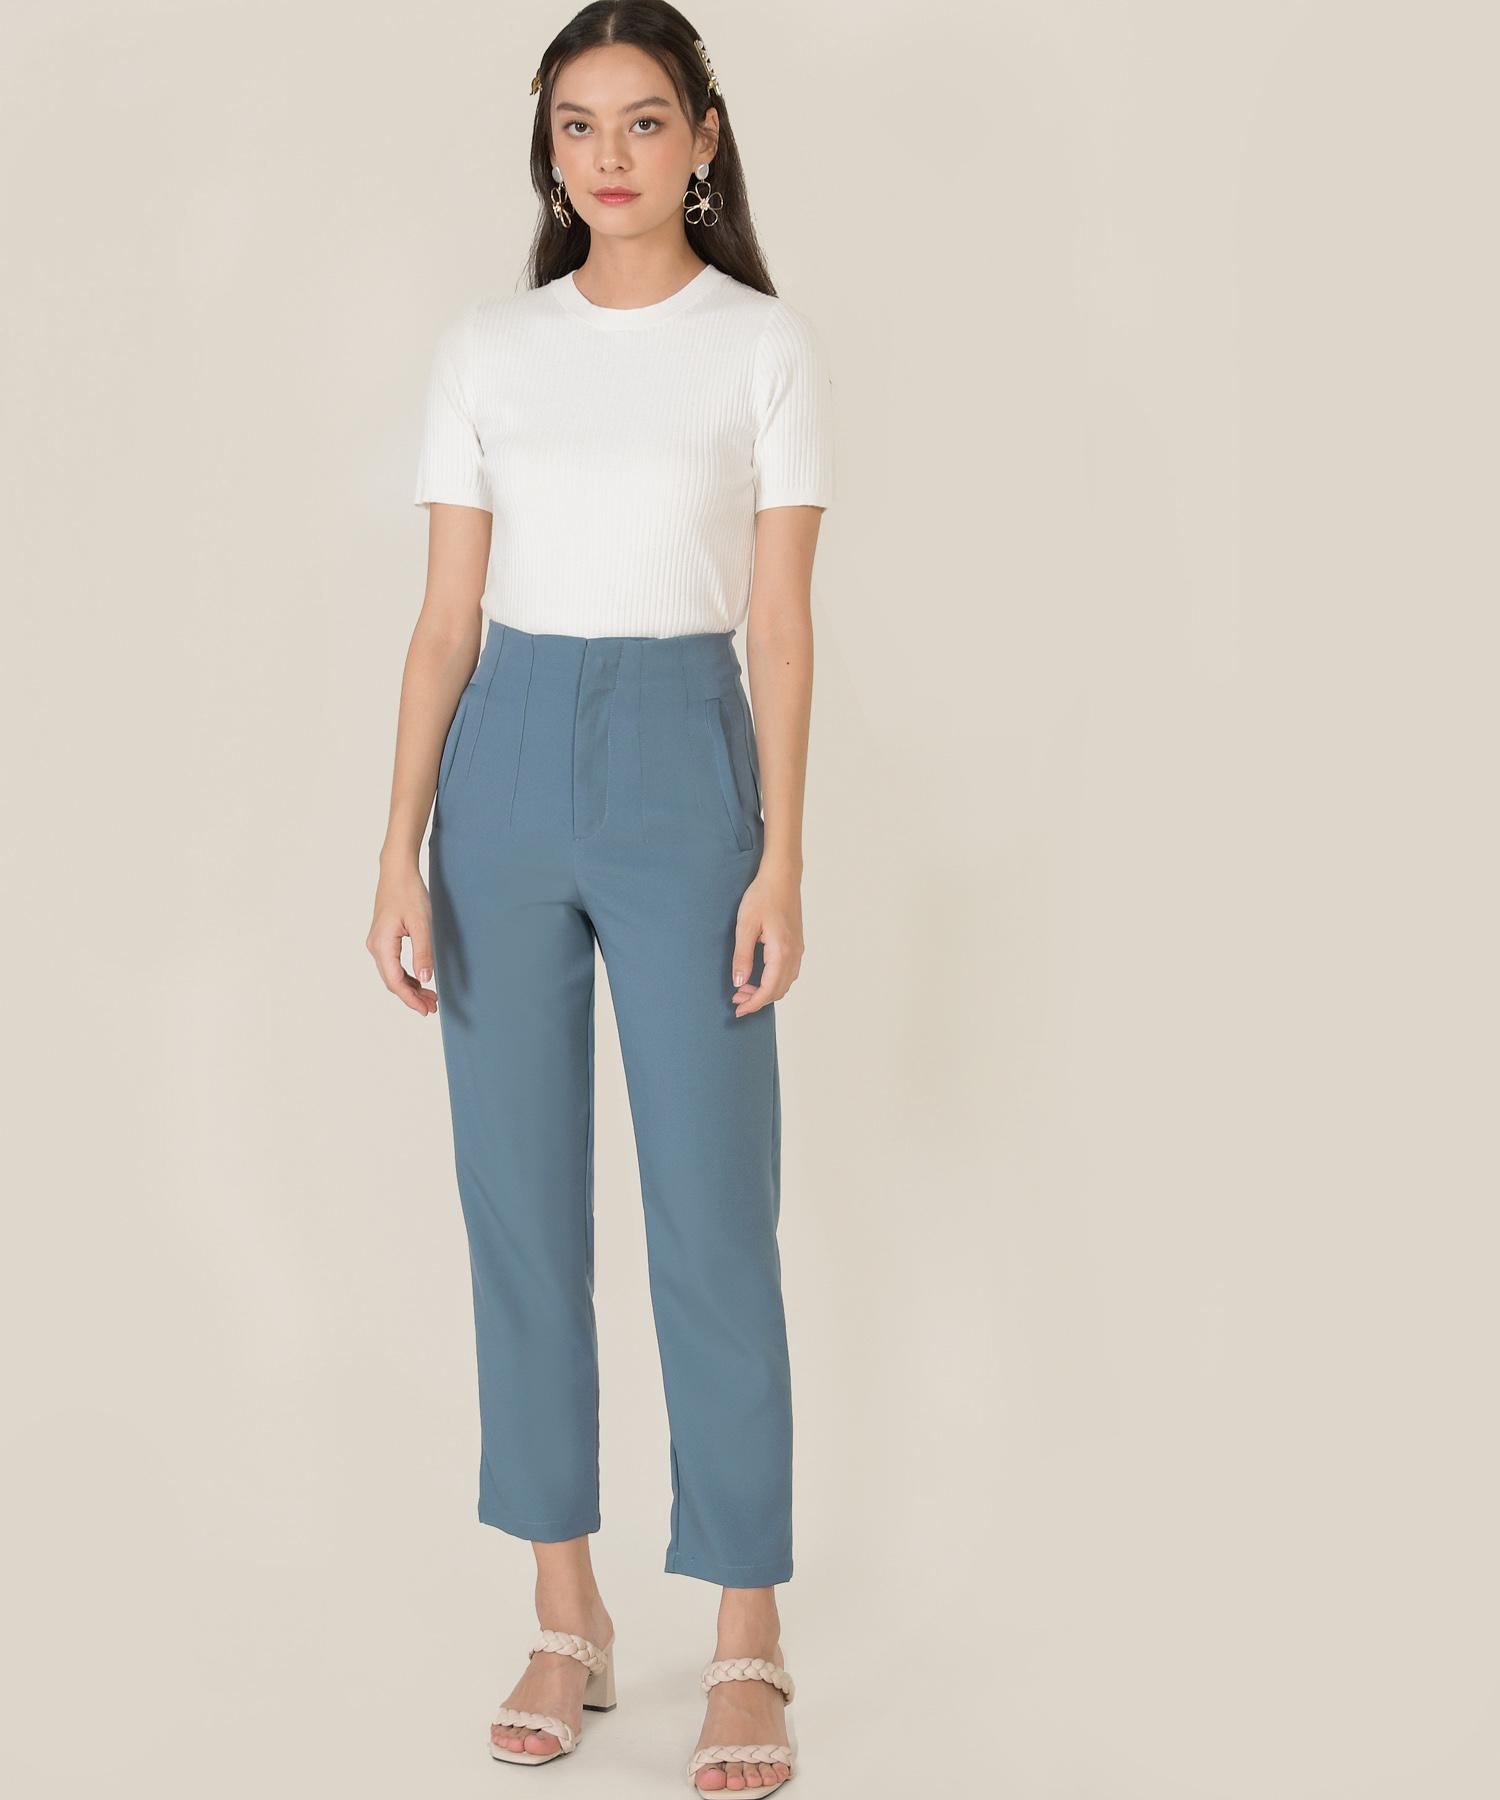 jette-tailored-pants-lucerne-blue-1